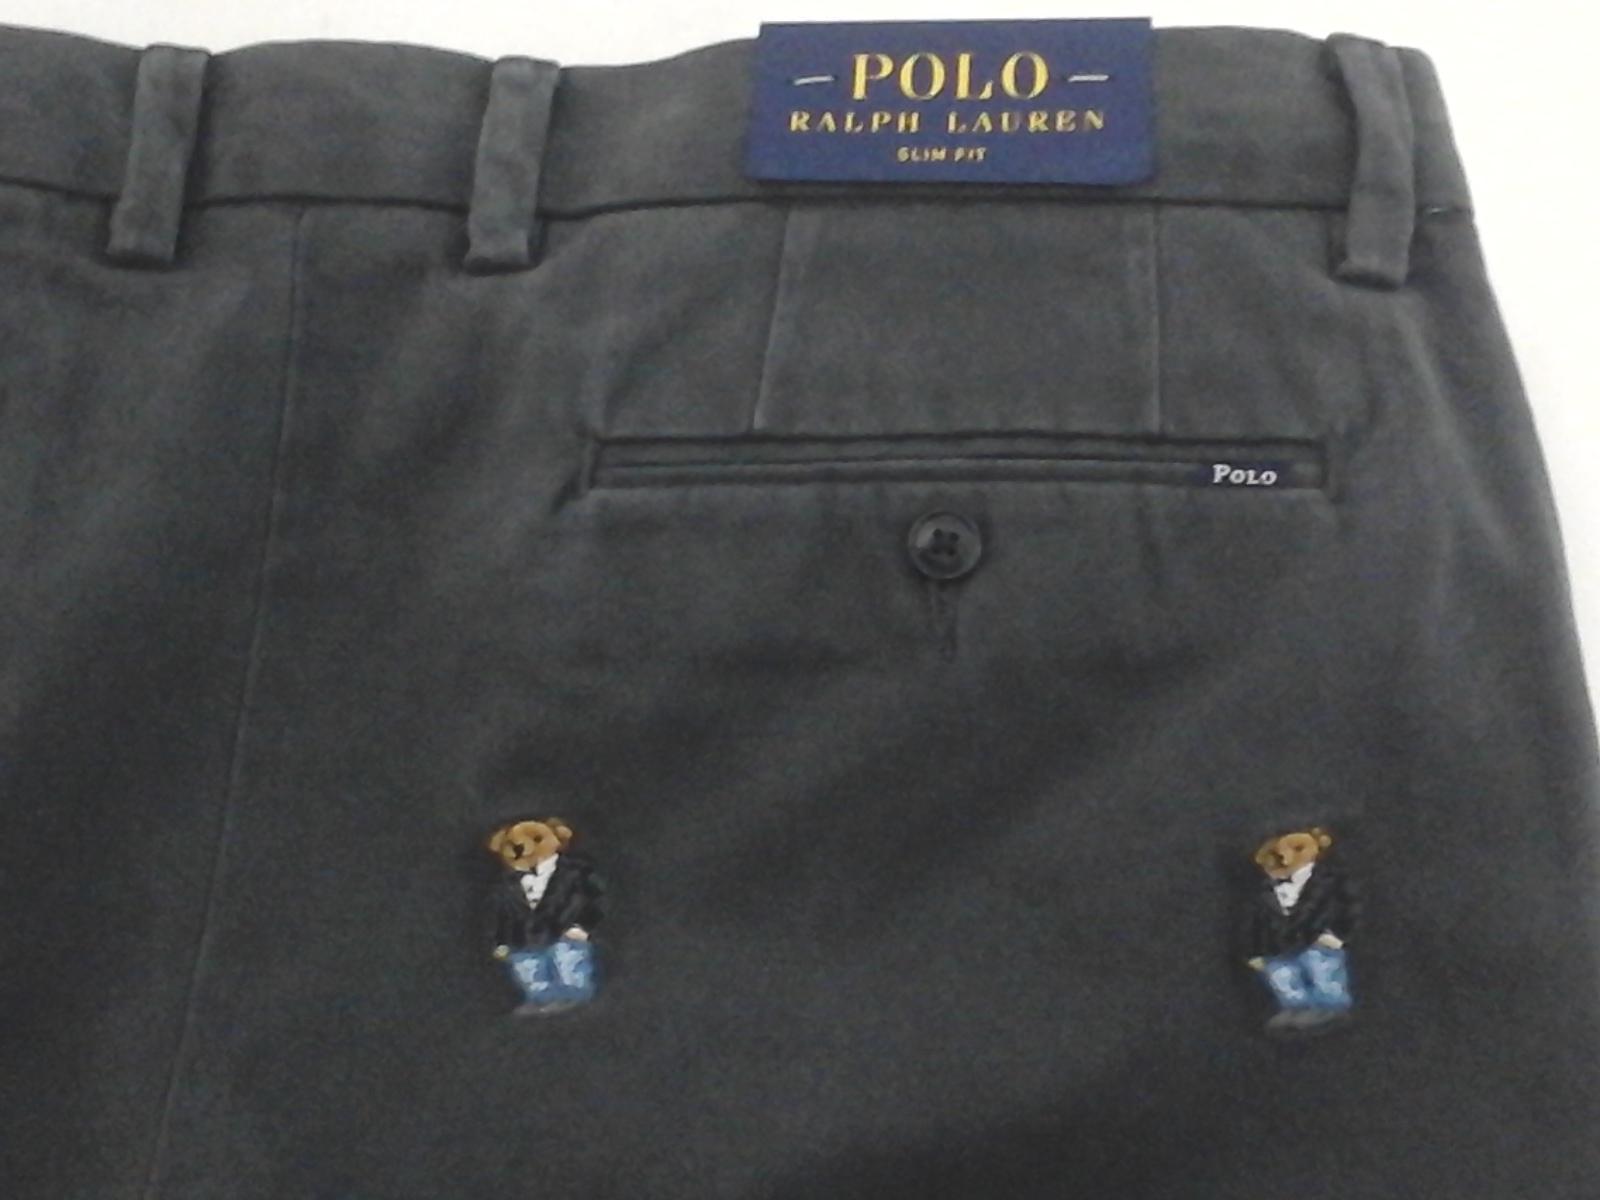 Polo RALPH LAUREN Polo Bear Chino Pants Khaki Slim Fit Embroidered Gray Mens New